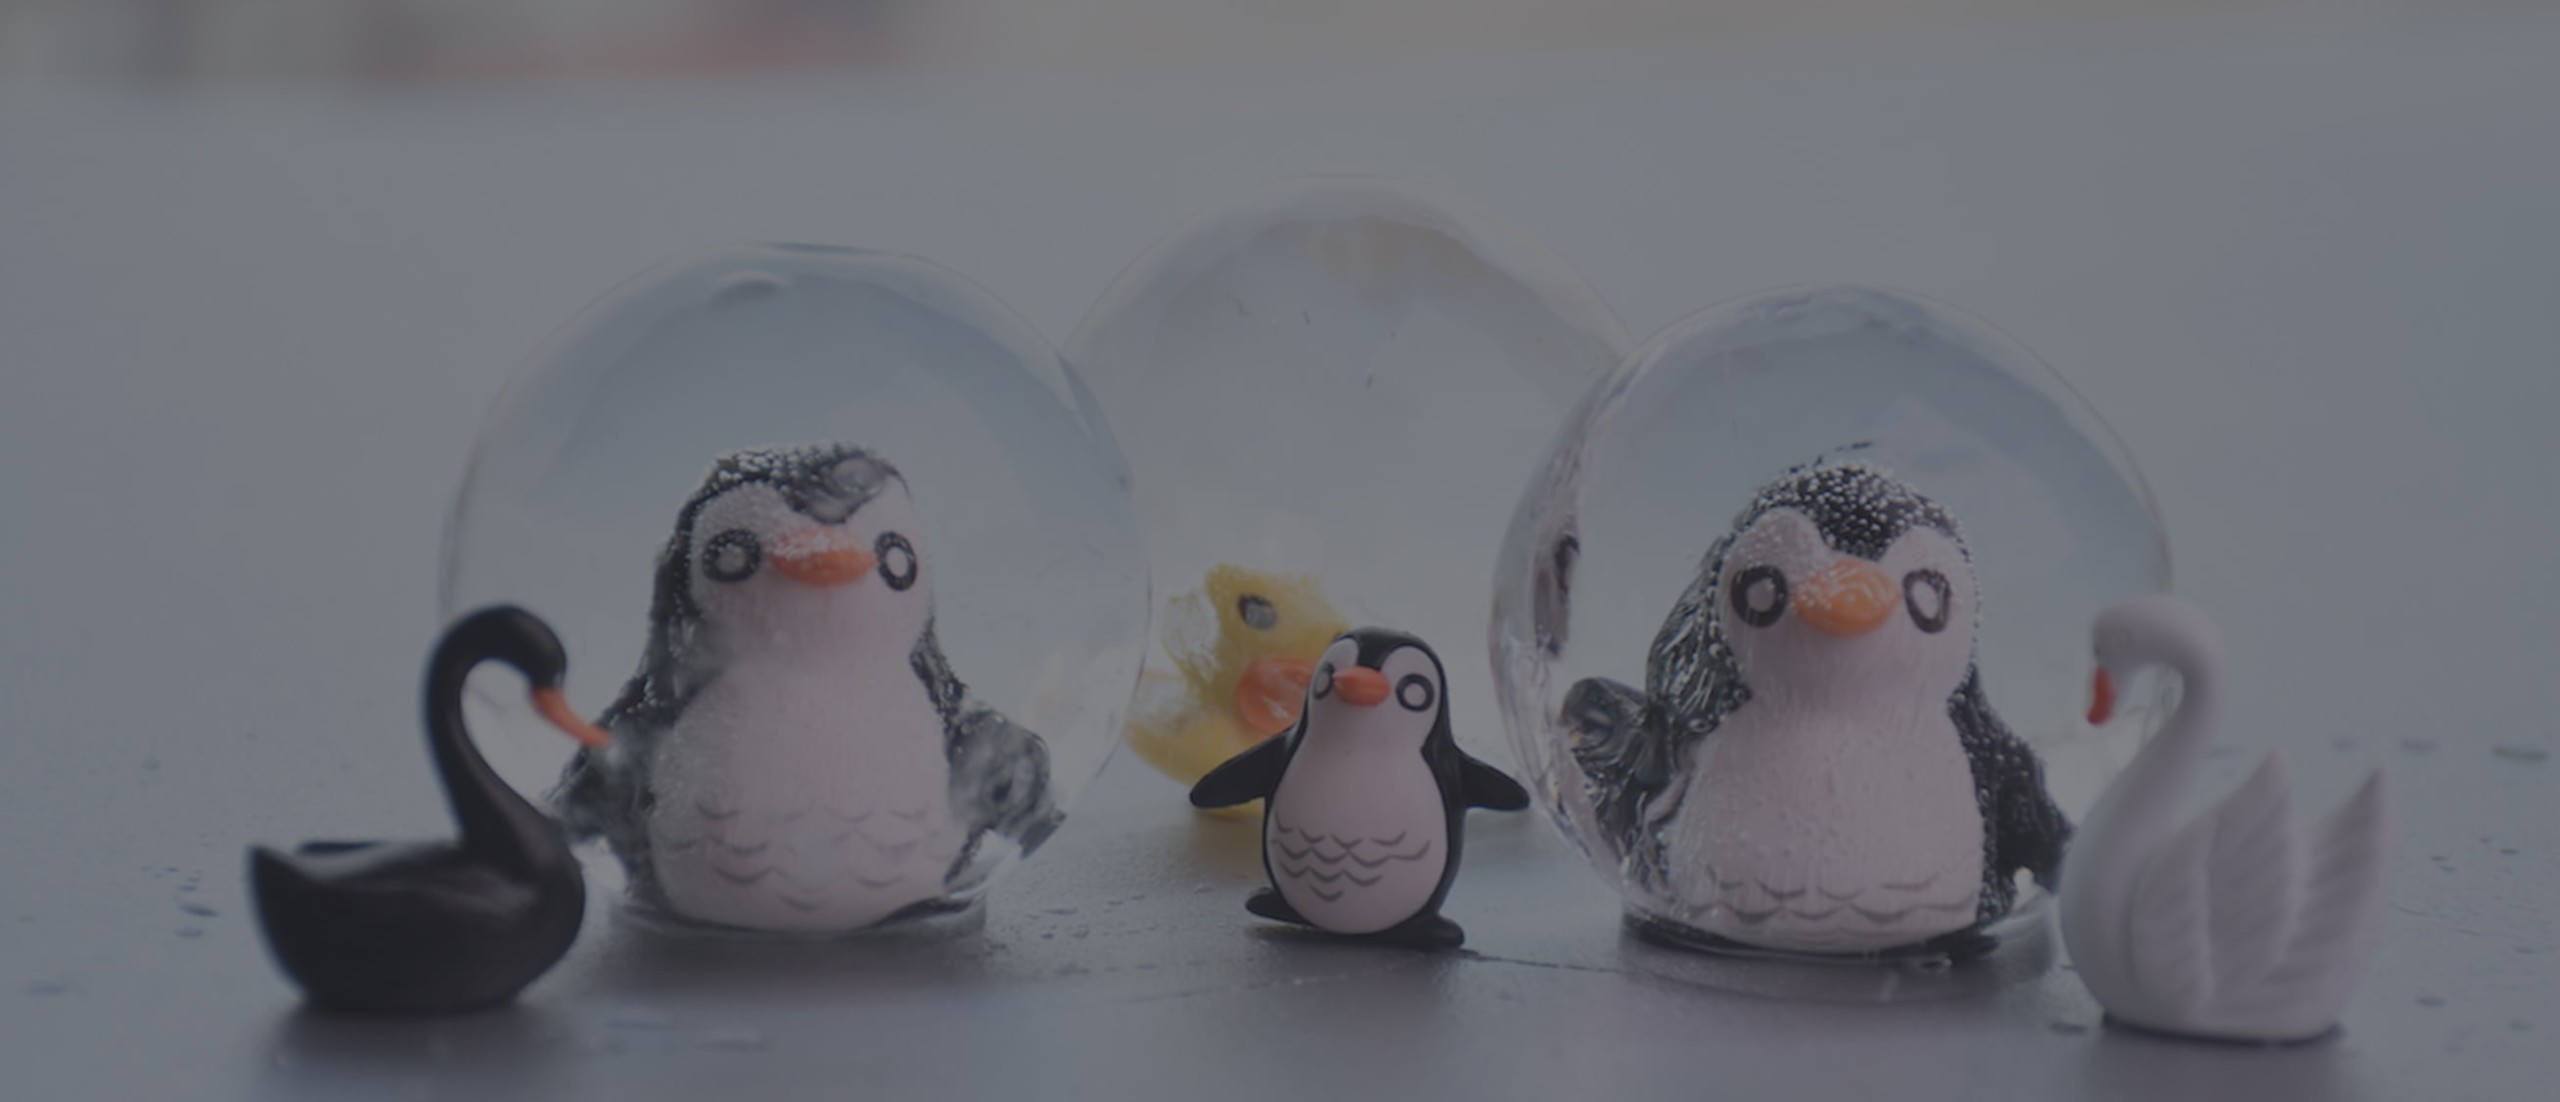 Polar Ice Ball 2.0 Spherical Ice Maker